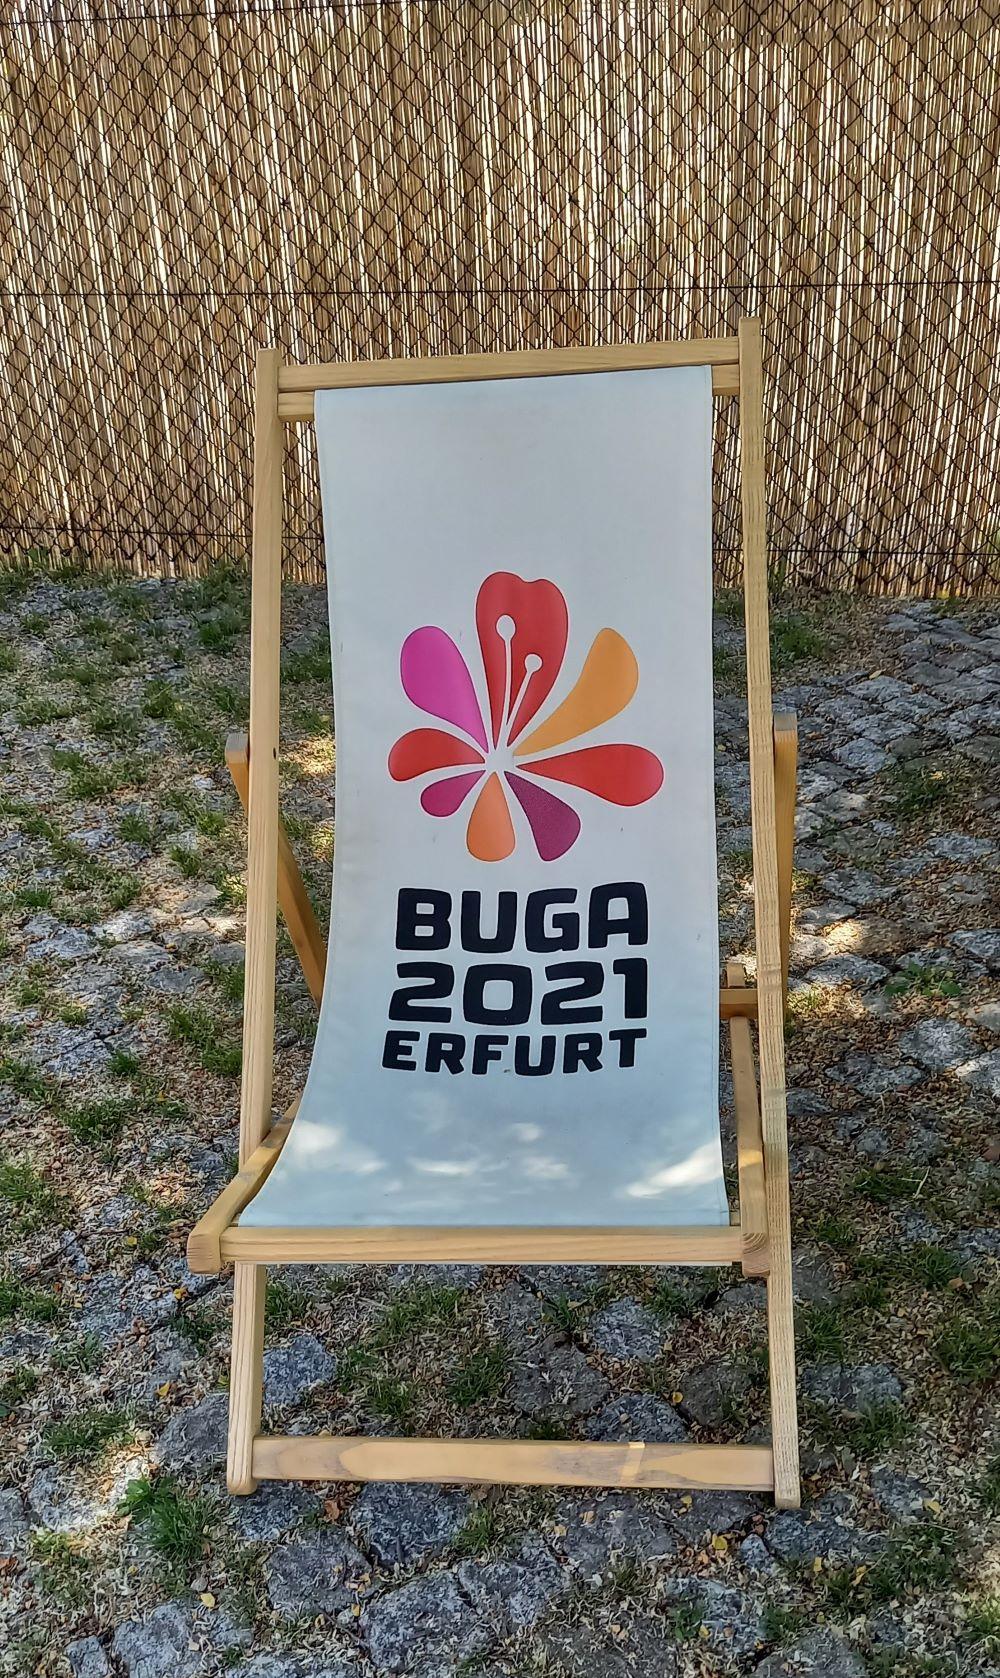 Liegestuhl mit BUGA 2021 Erfurt auf dem Petersberg